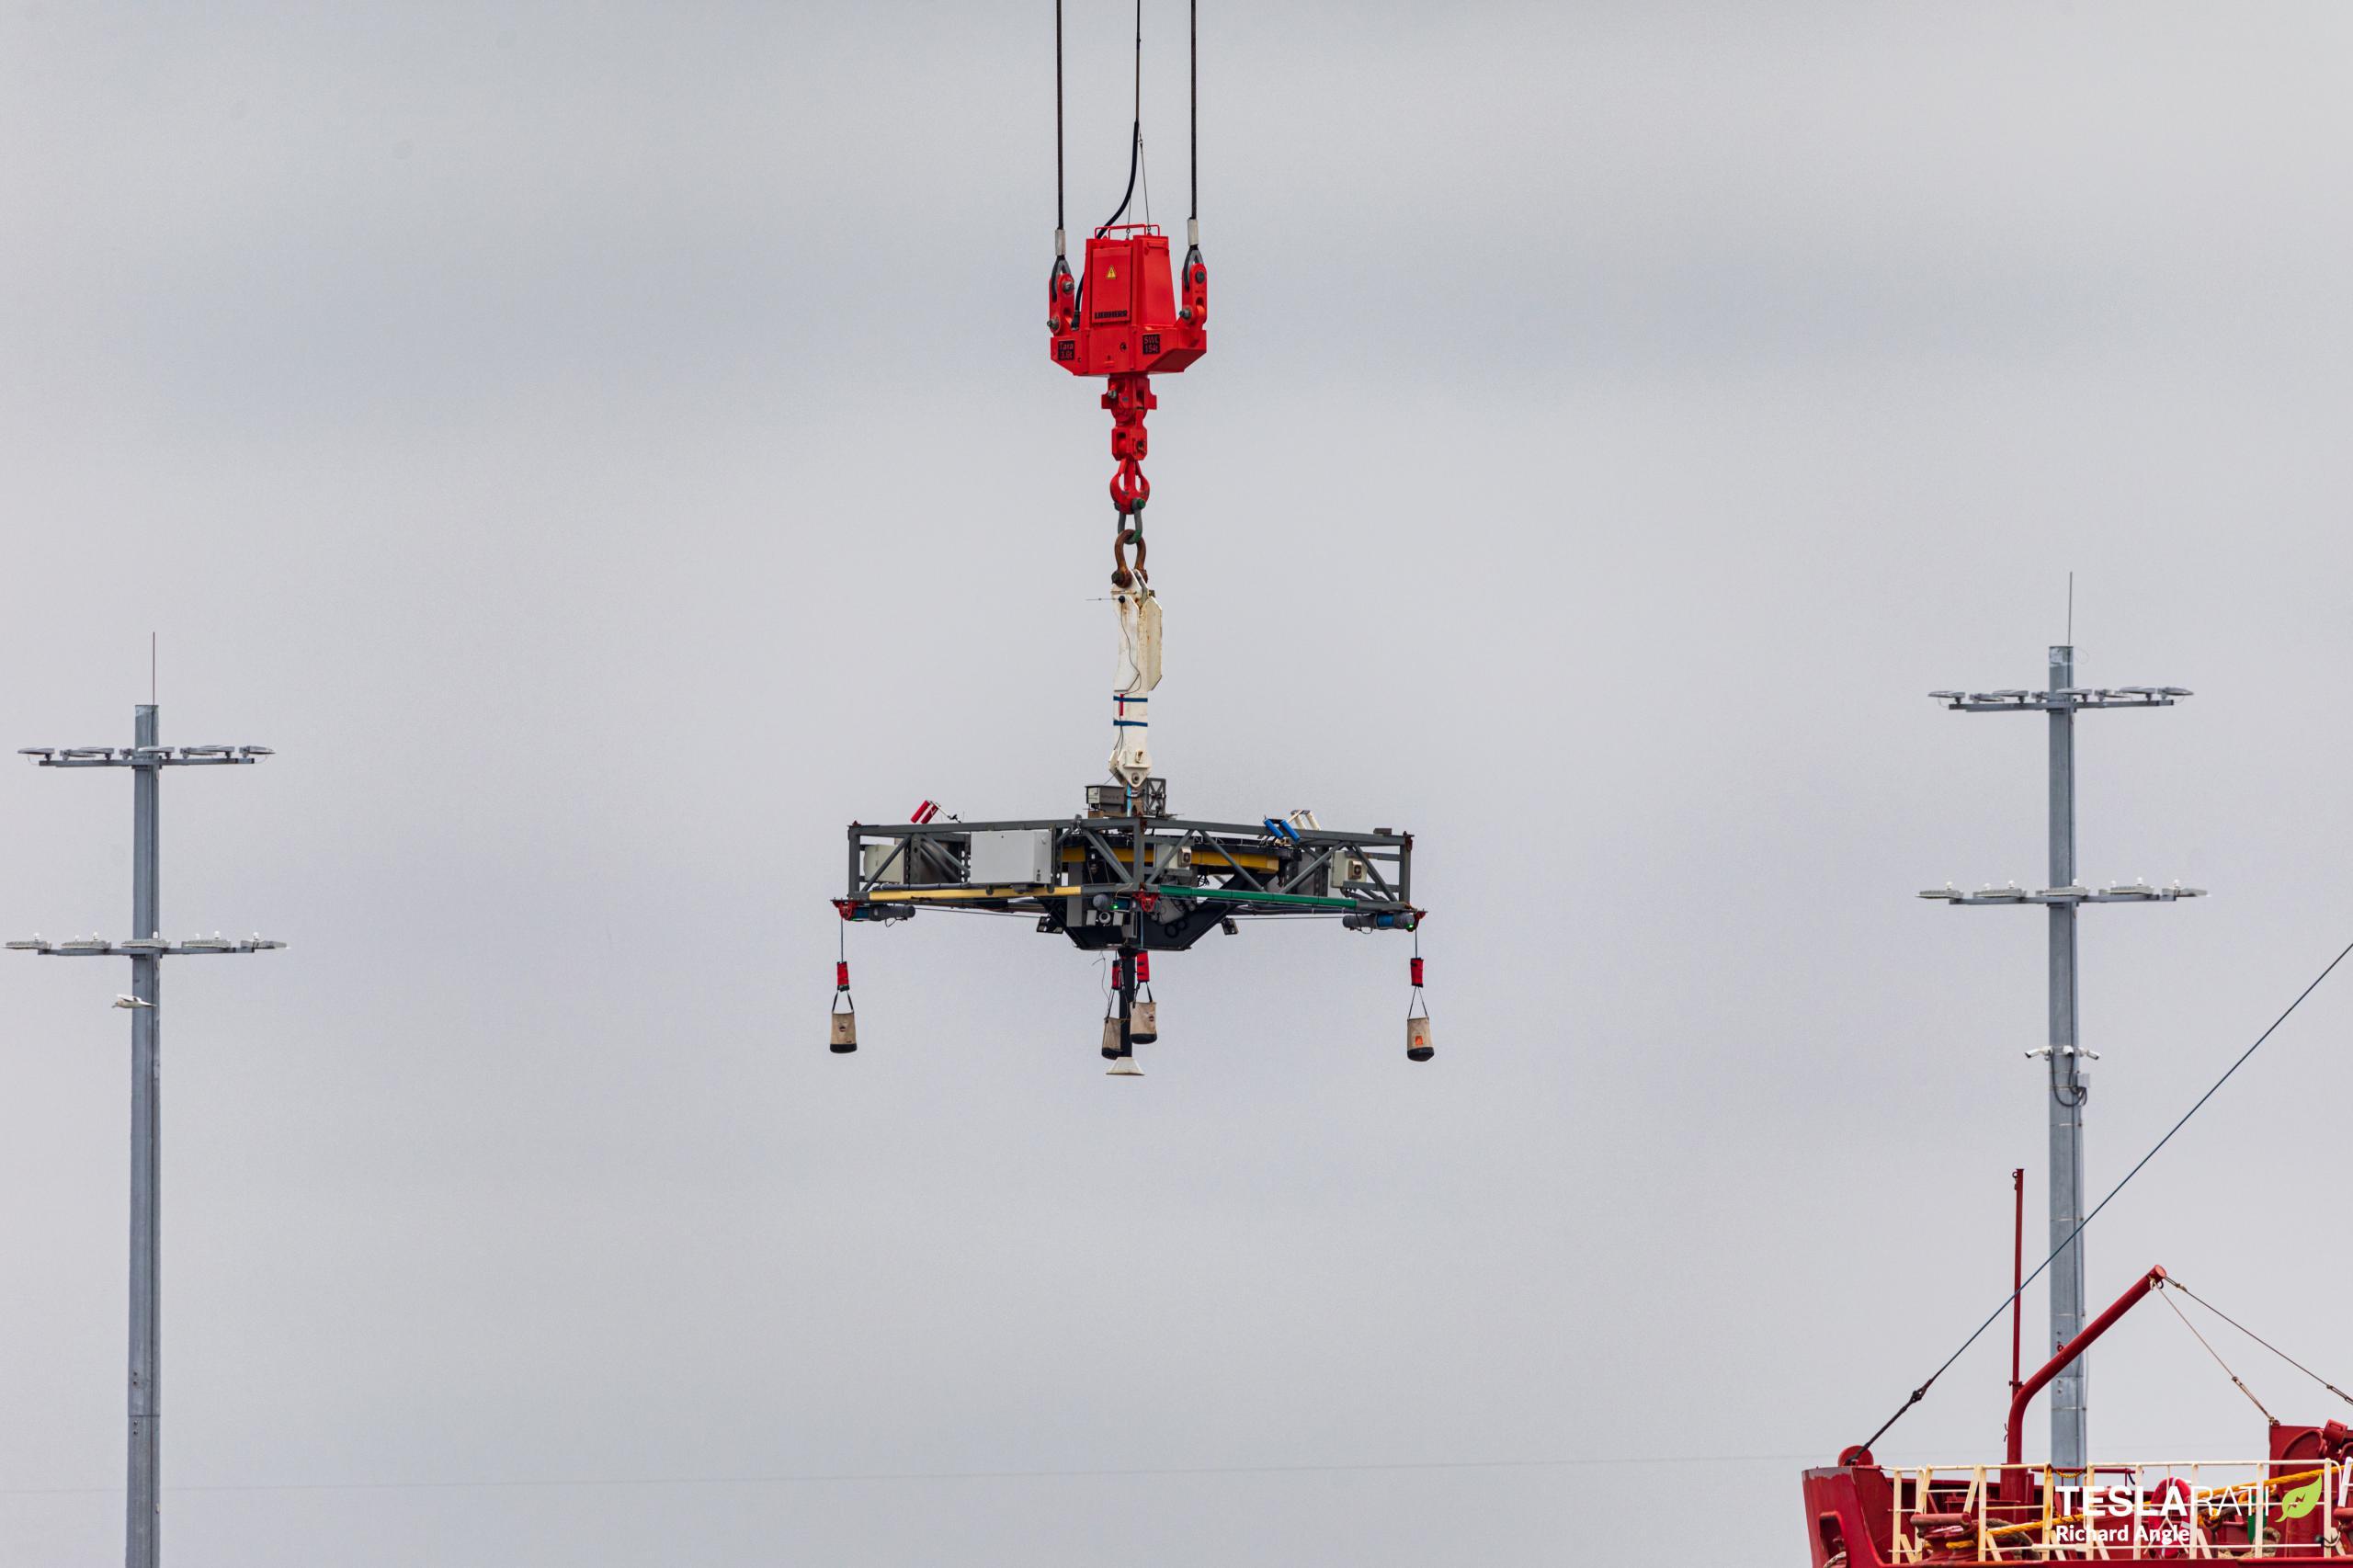 Turksat 5A Falcon 9 B1060 011221 (Richard Angle) recovery (1) (c)